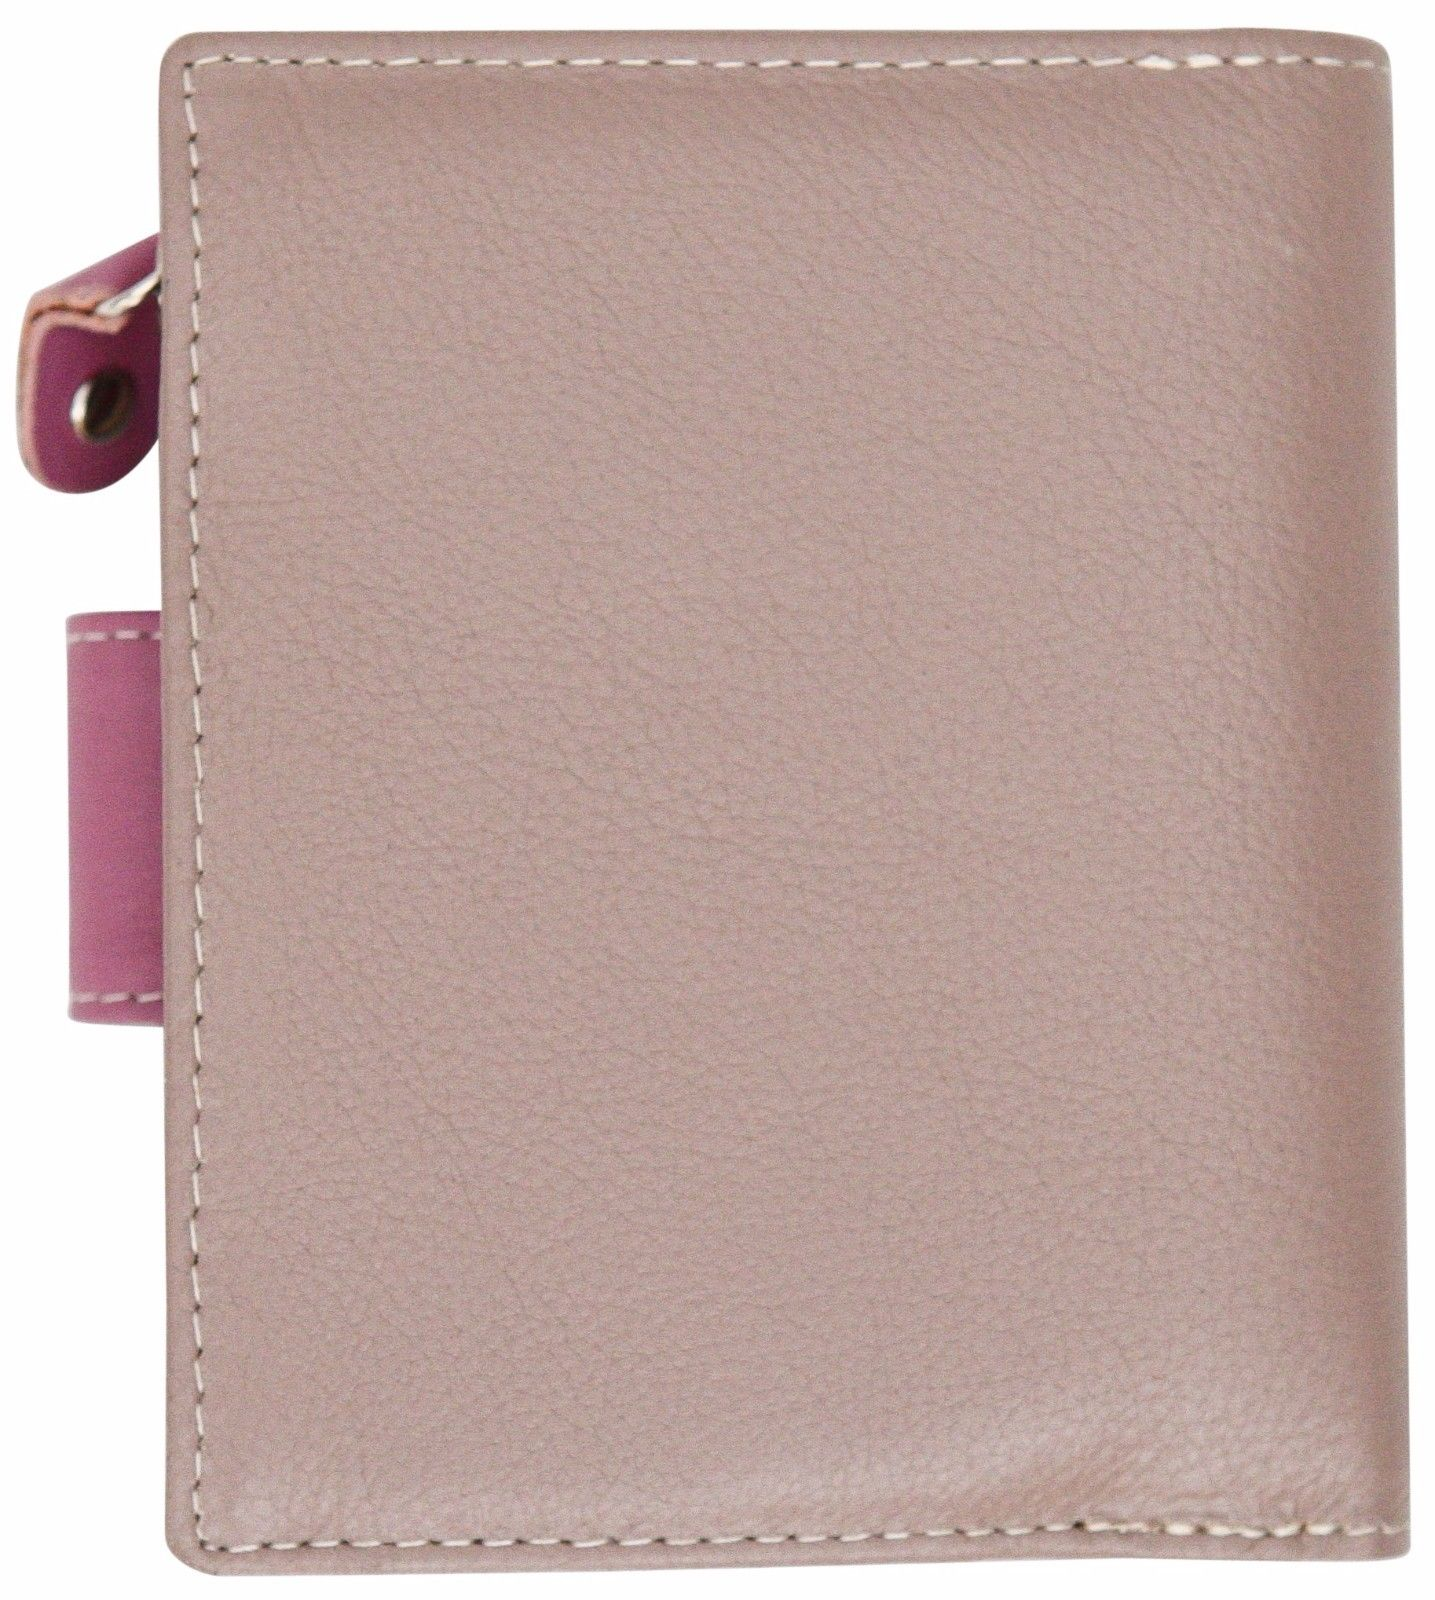 Felda-RFID-onorevoli-MEDAGLIA-amp-Card-Purse-Wallet-Genuine-Leather-Multi-SOFT-BOX-REGALO miniatura 85